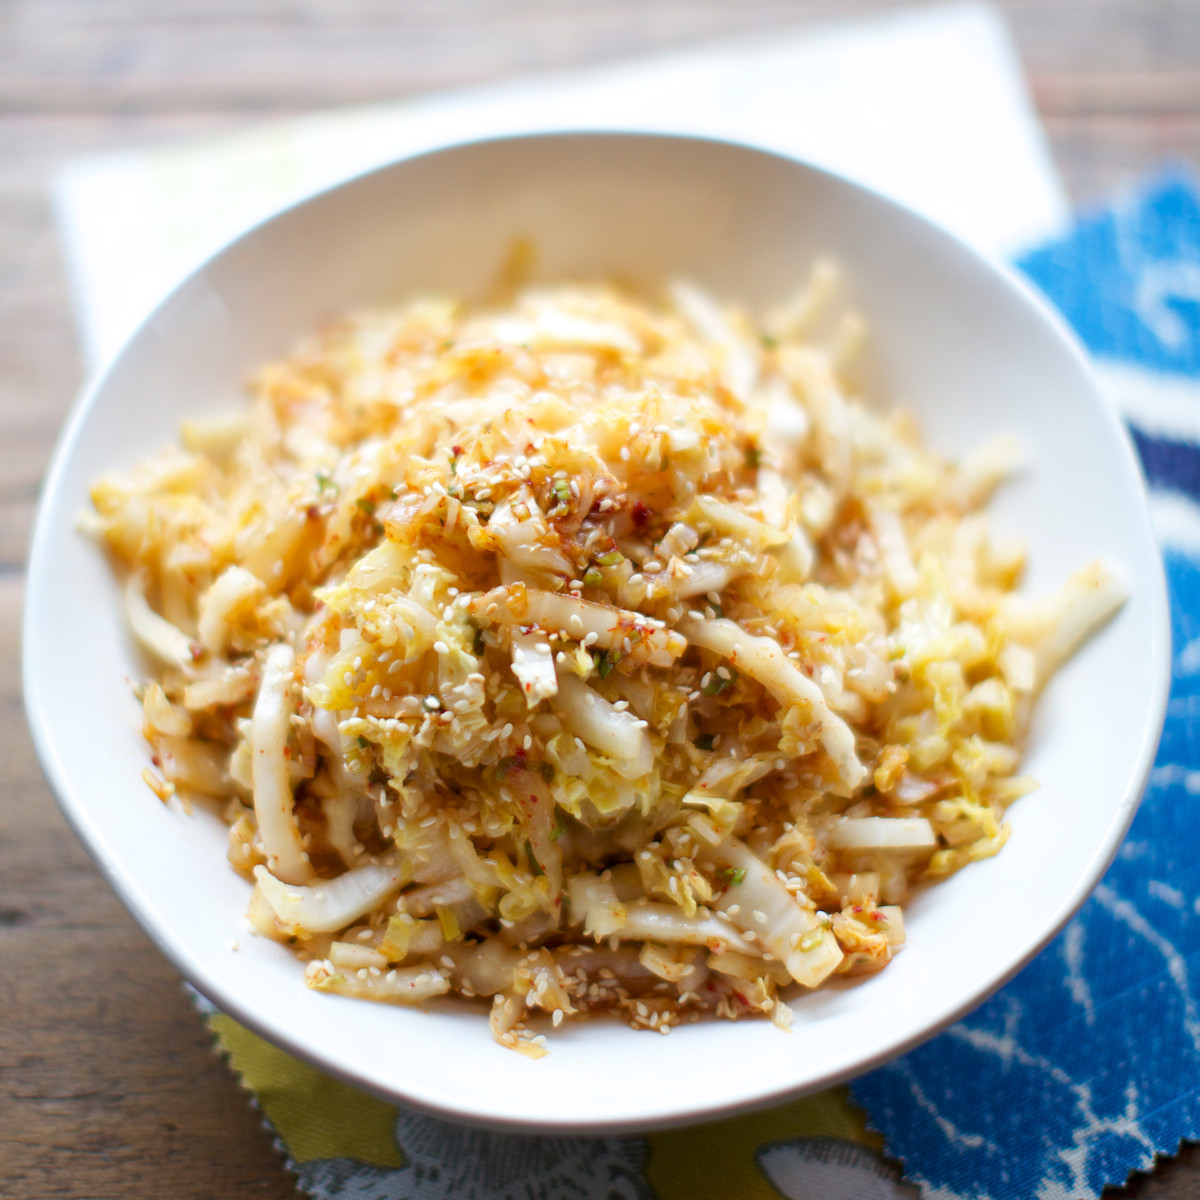 Stir Fry Napa Cabbage  Stir Fried Napa Cabbage with Spicy Garlic Dressing Recipe